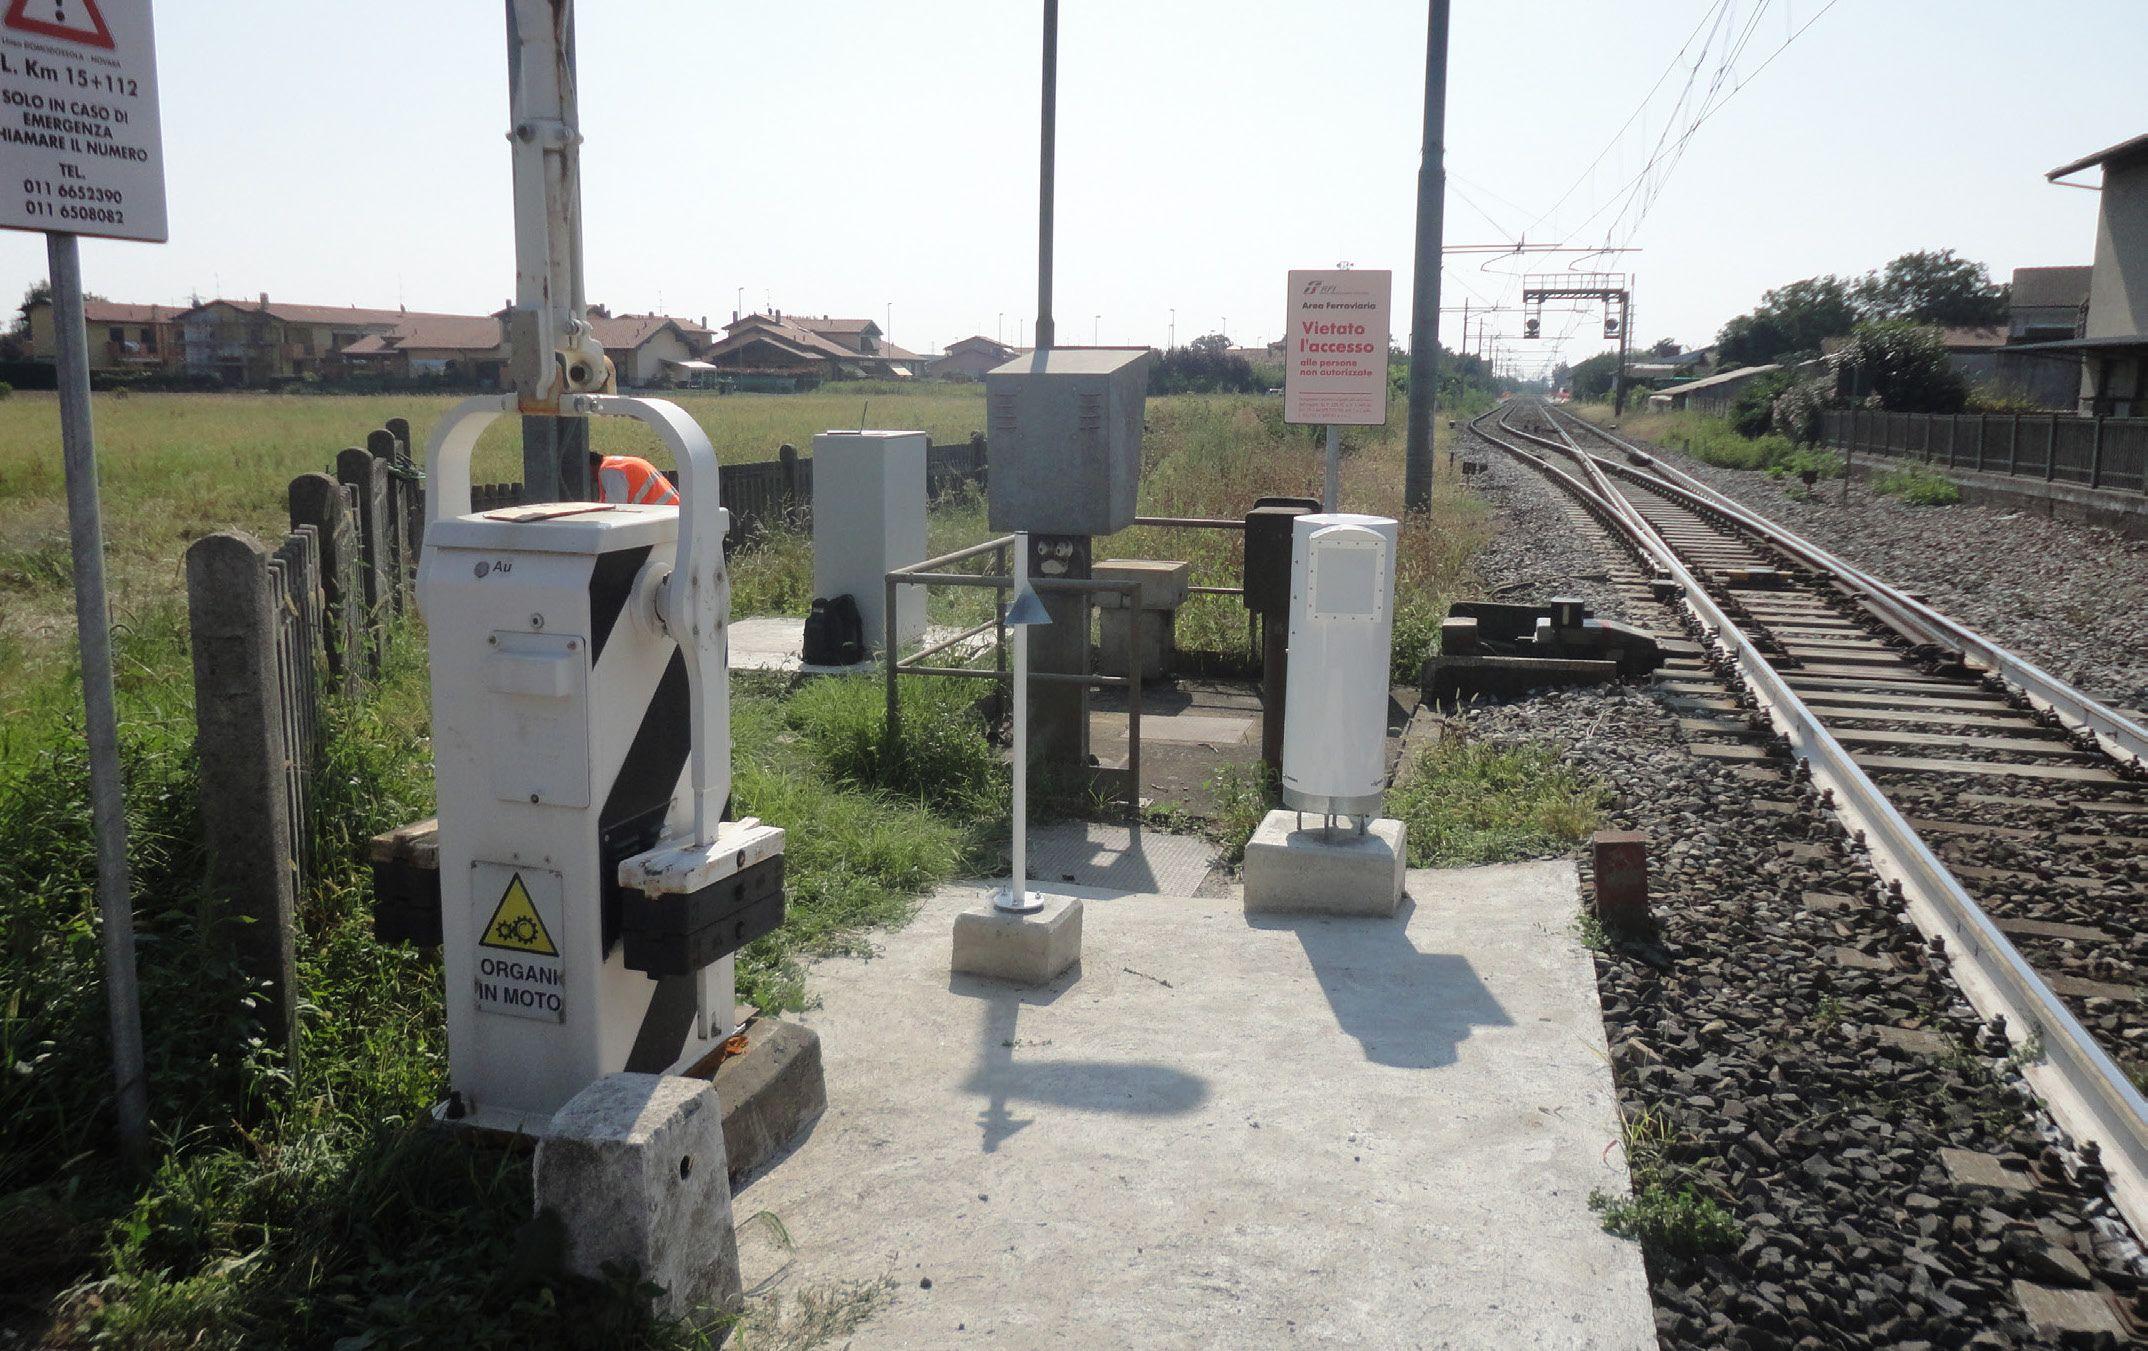 Progress Rail | Signaling